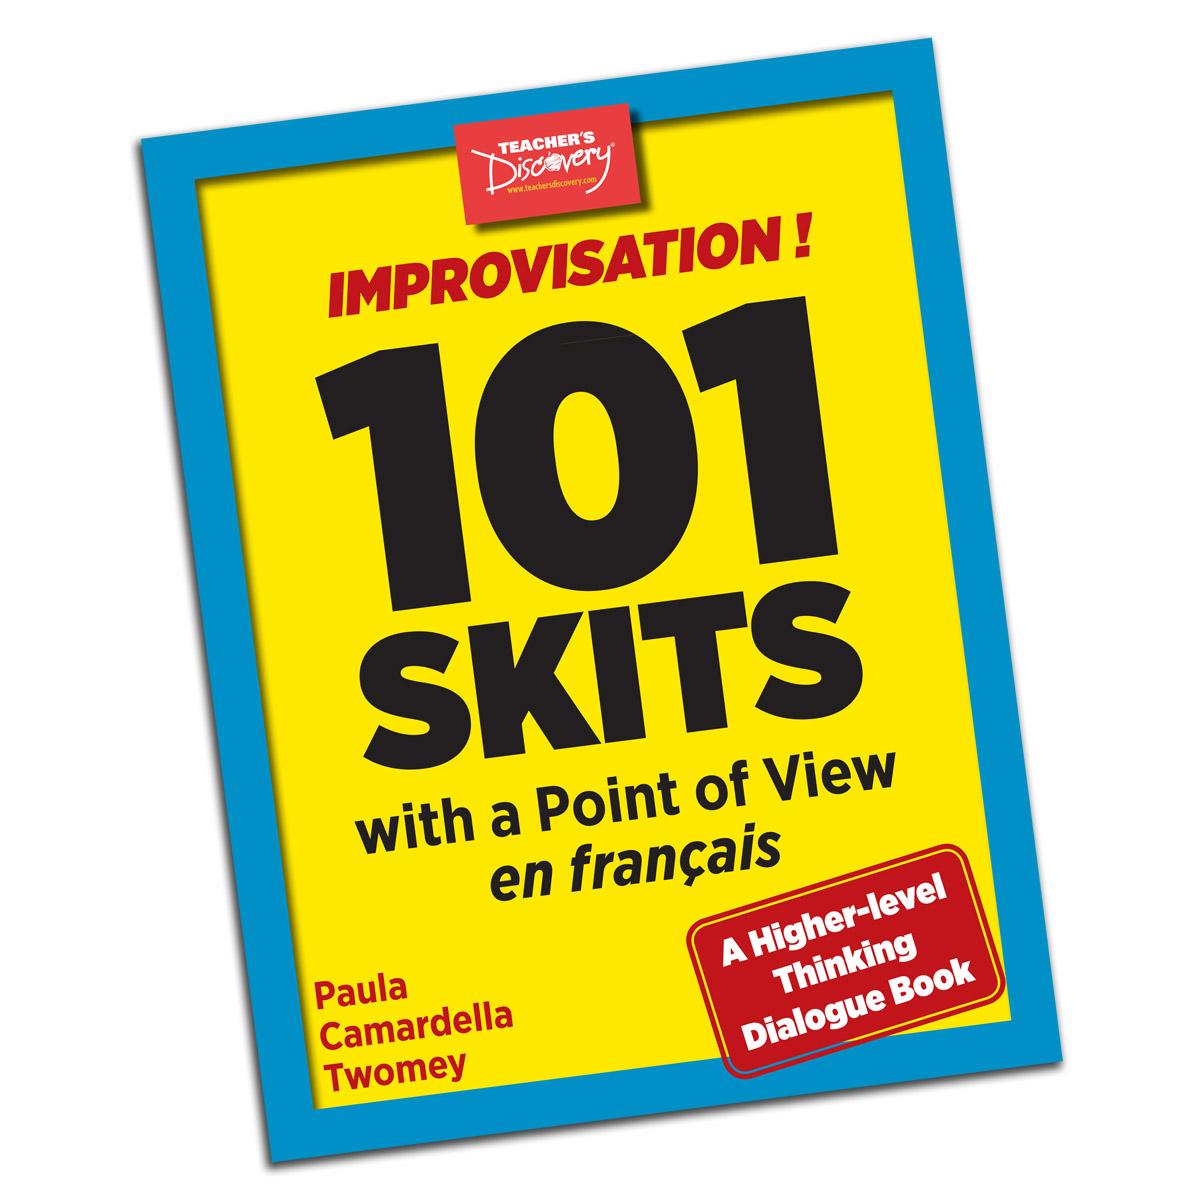 Improvisation ! 101 Skits with a Point of View en français Book